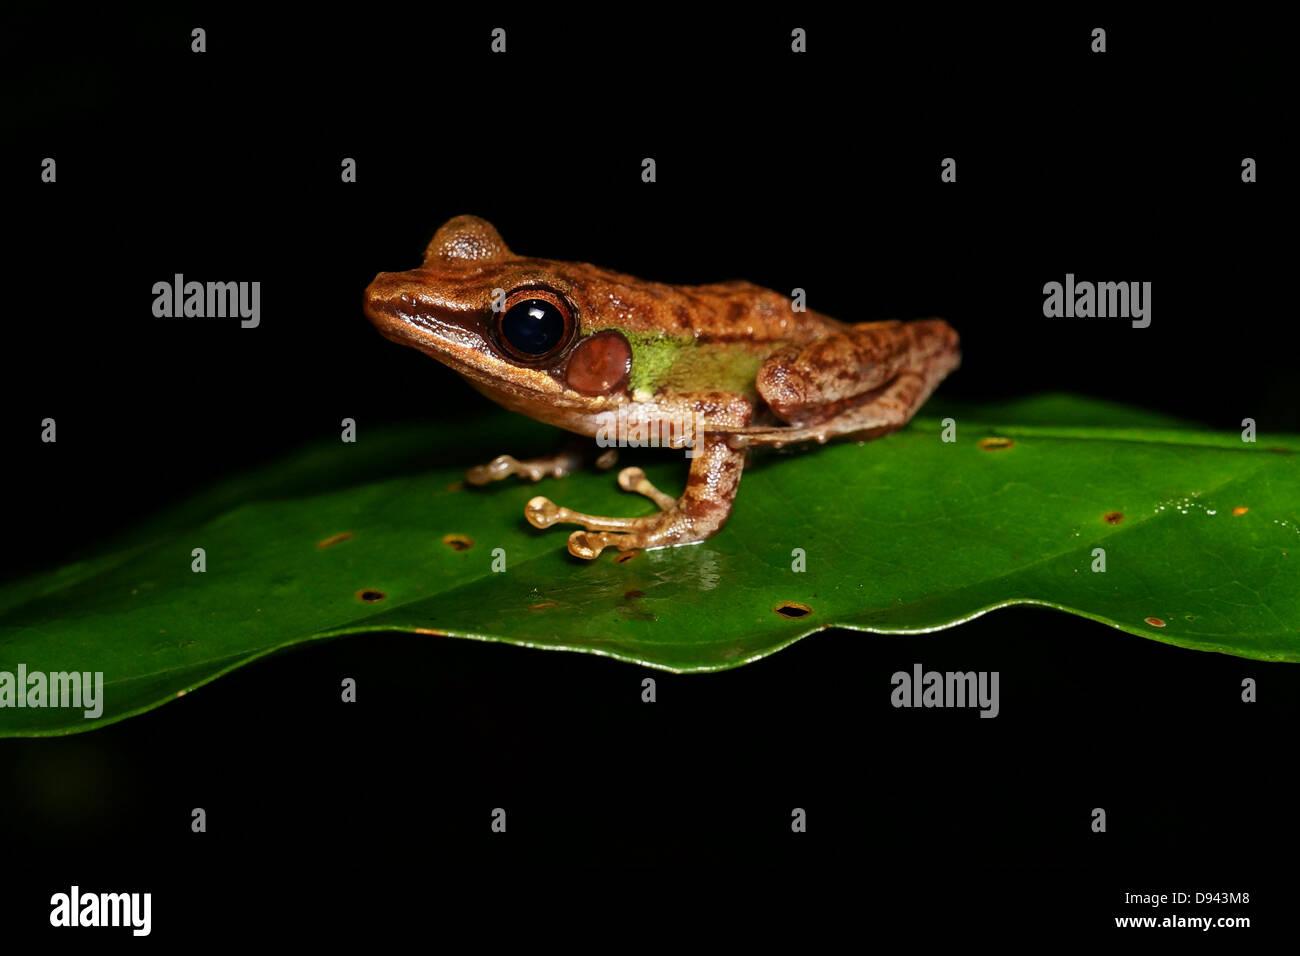 Hylarana megalonesa Large white-lipped frog in Kinabatangan River, Sabah, Malaysia, Borneo. Discovered in 2009 - Stock Image